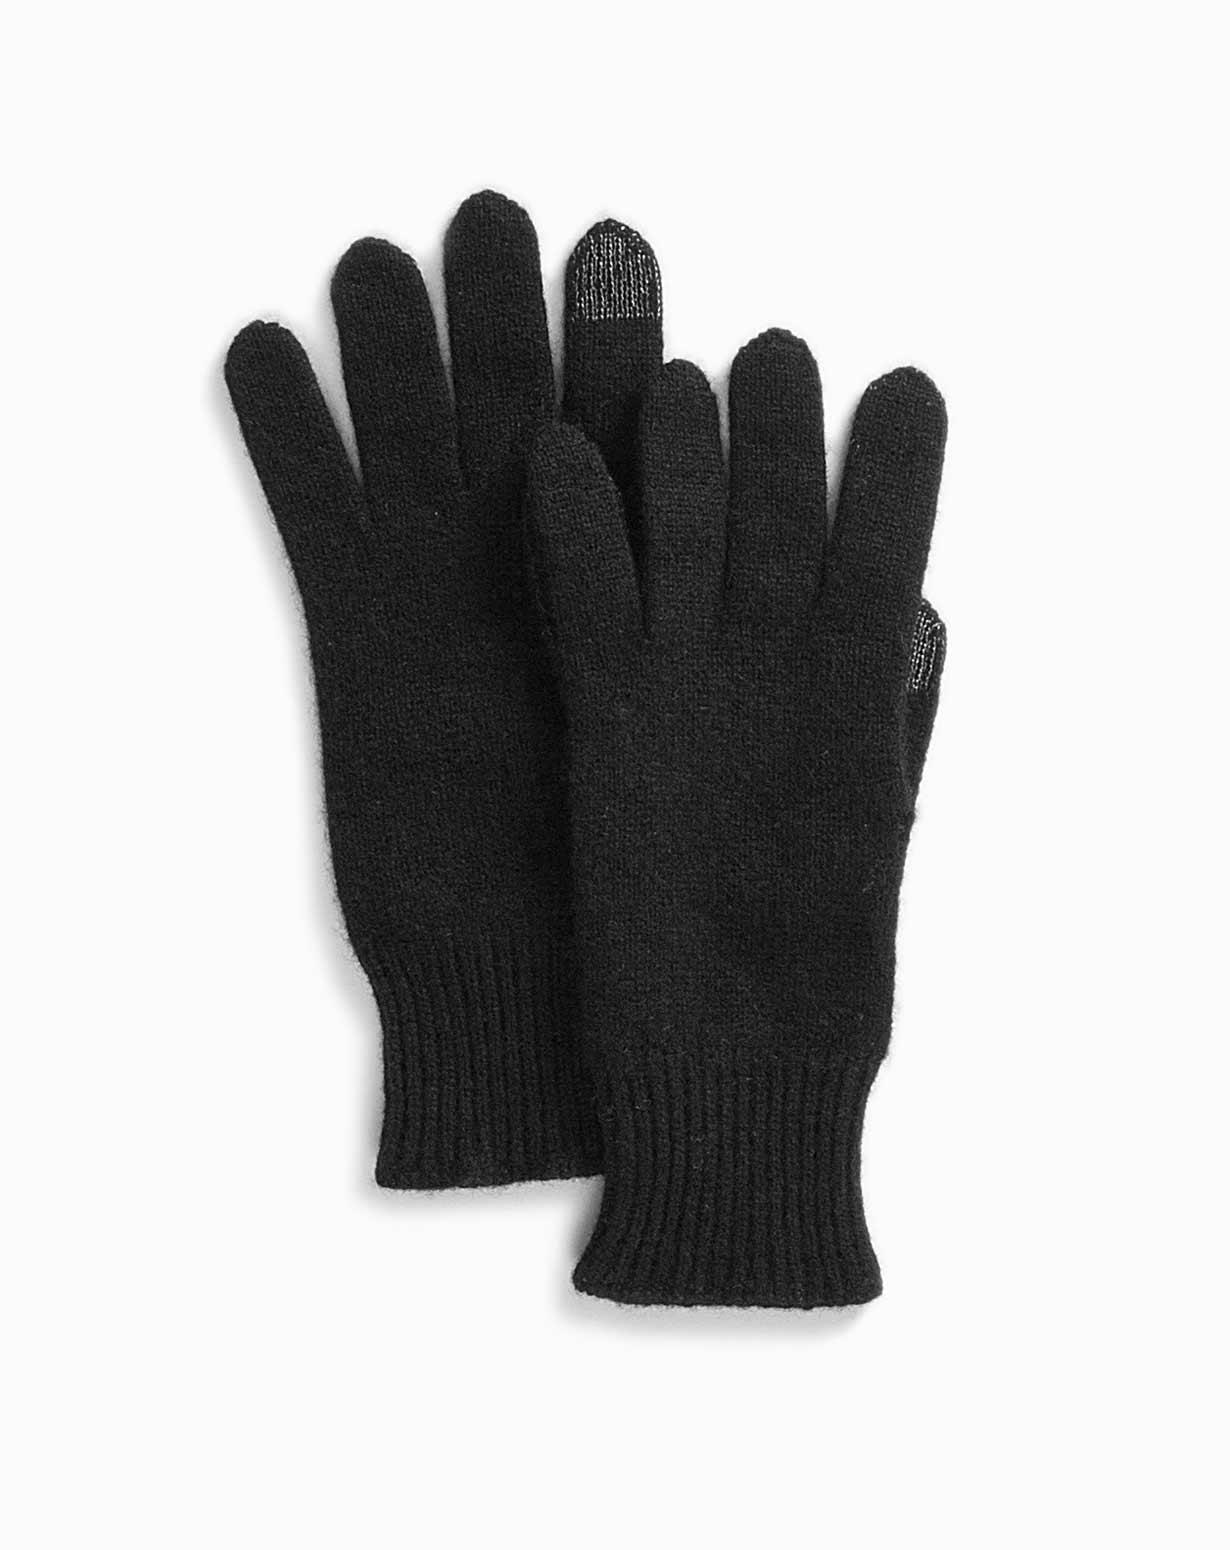 57527e265b12a Women's Cashmere Touchscreen Gloves   MaisonCashmere